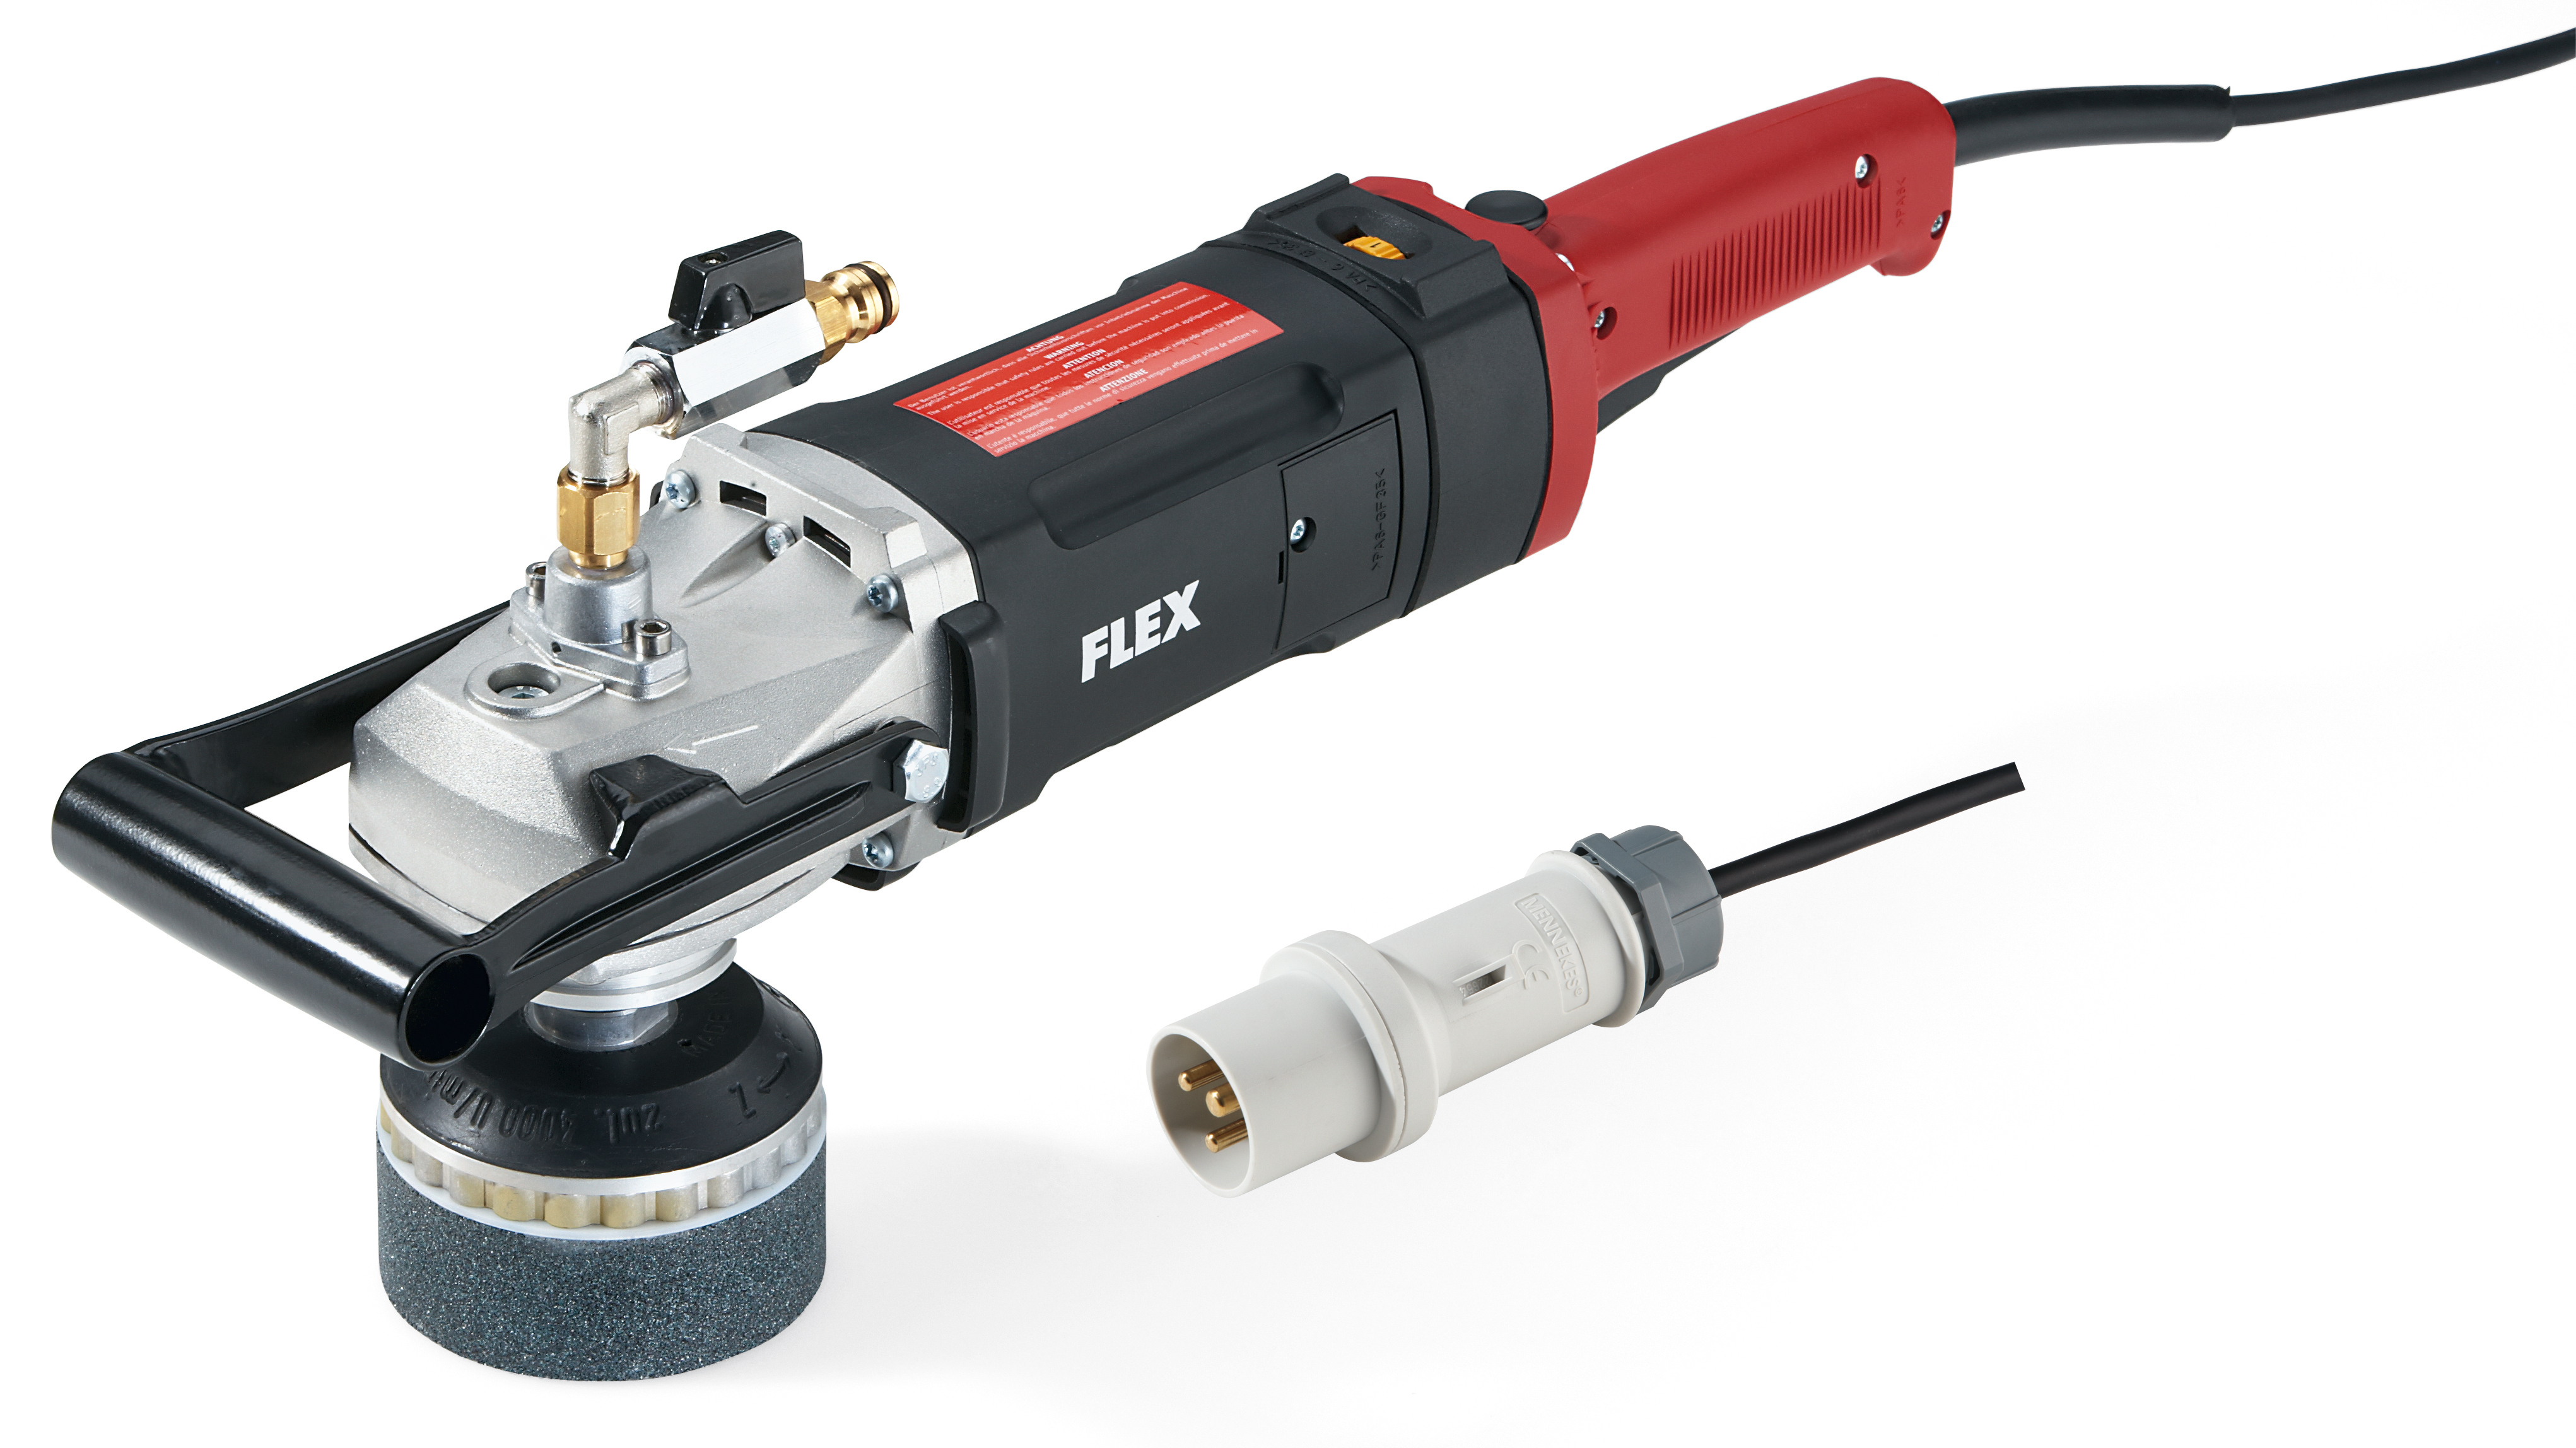 FLEX Nass- Winkelschleifer LW 802 VR